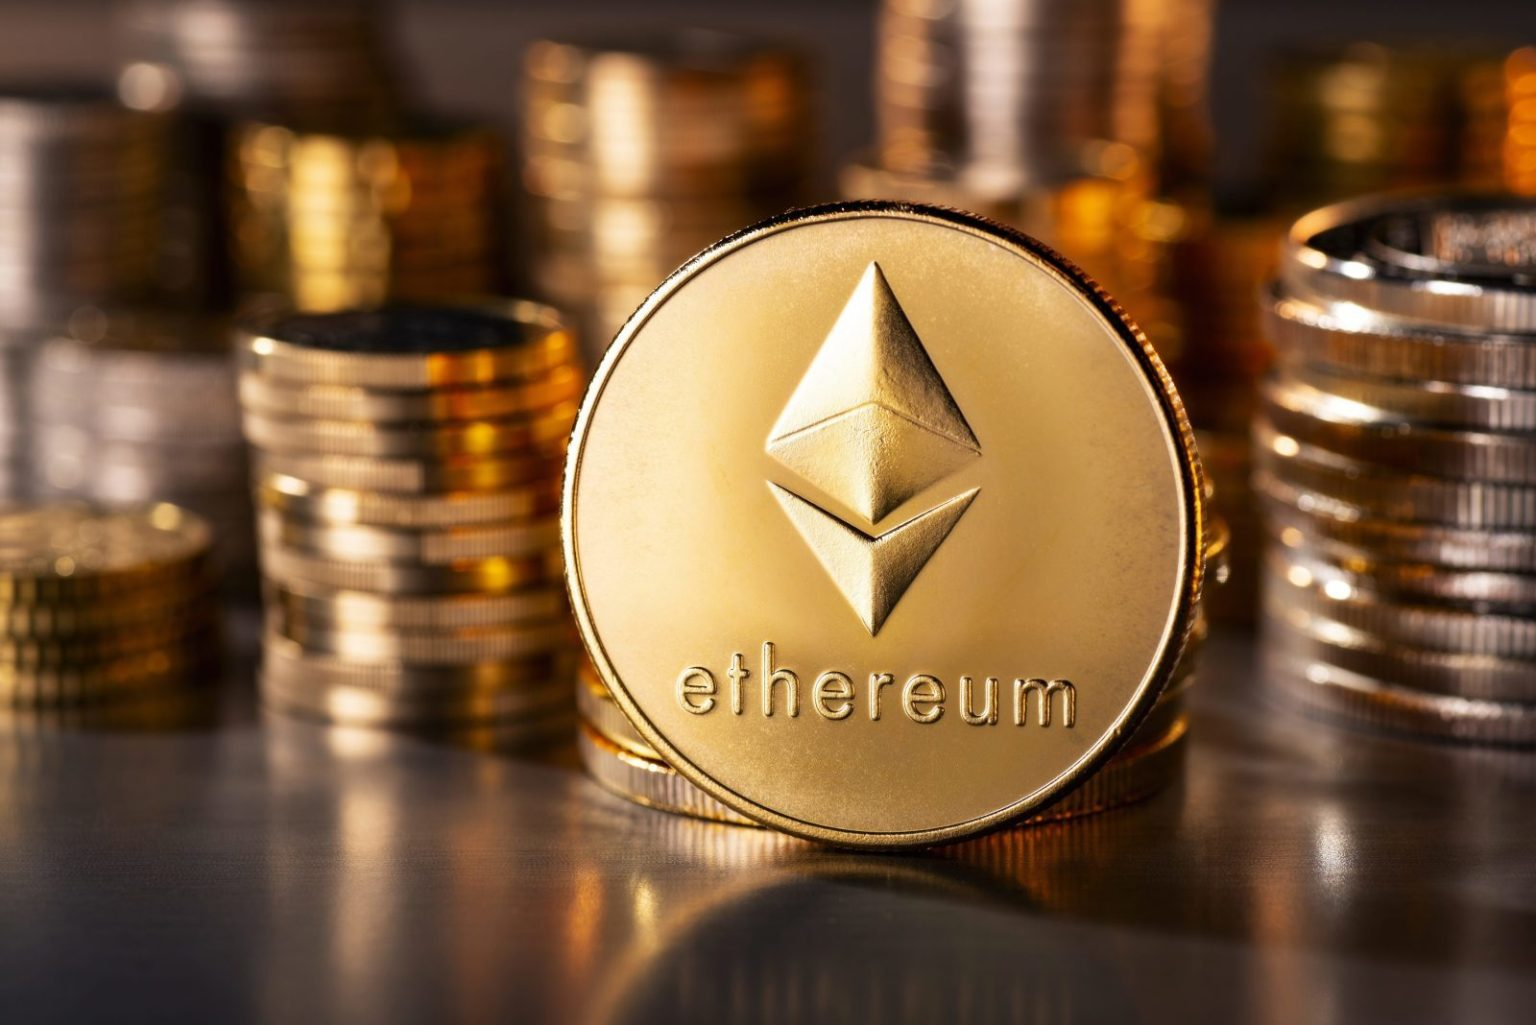 Ethereum - اتریوم از حجم بازاری پِیپال پیشی گرفت